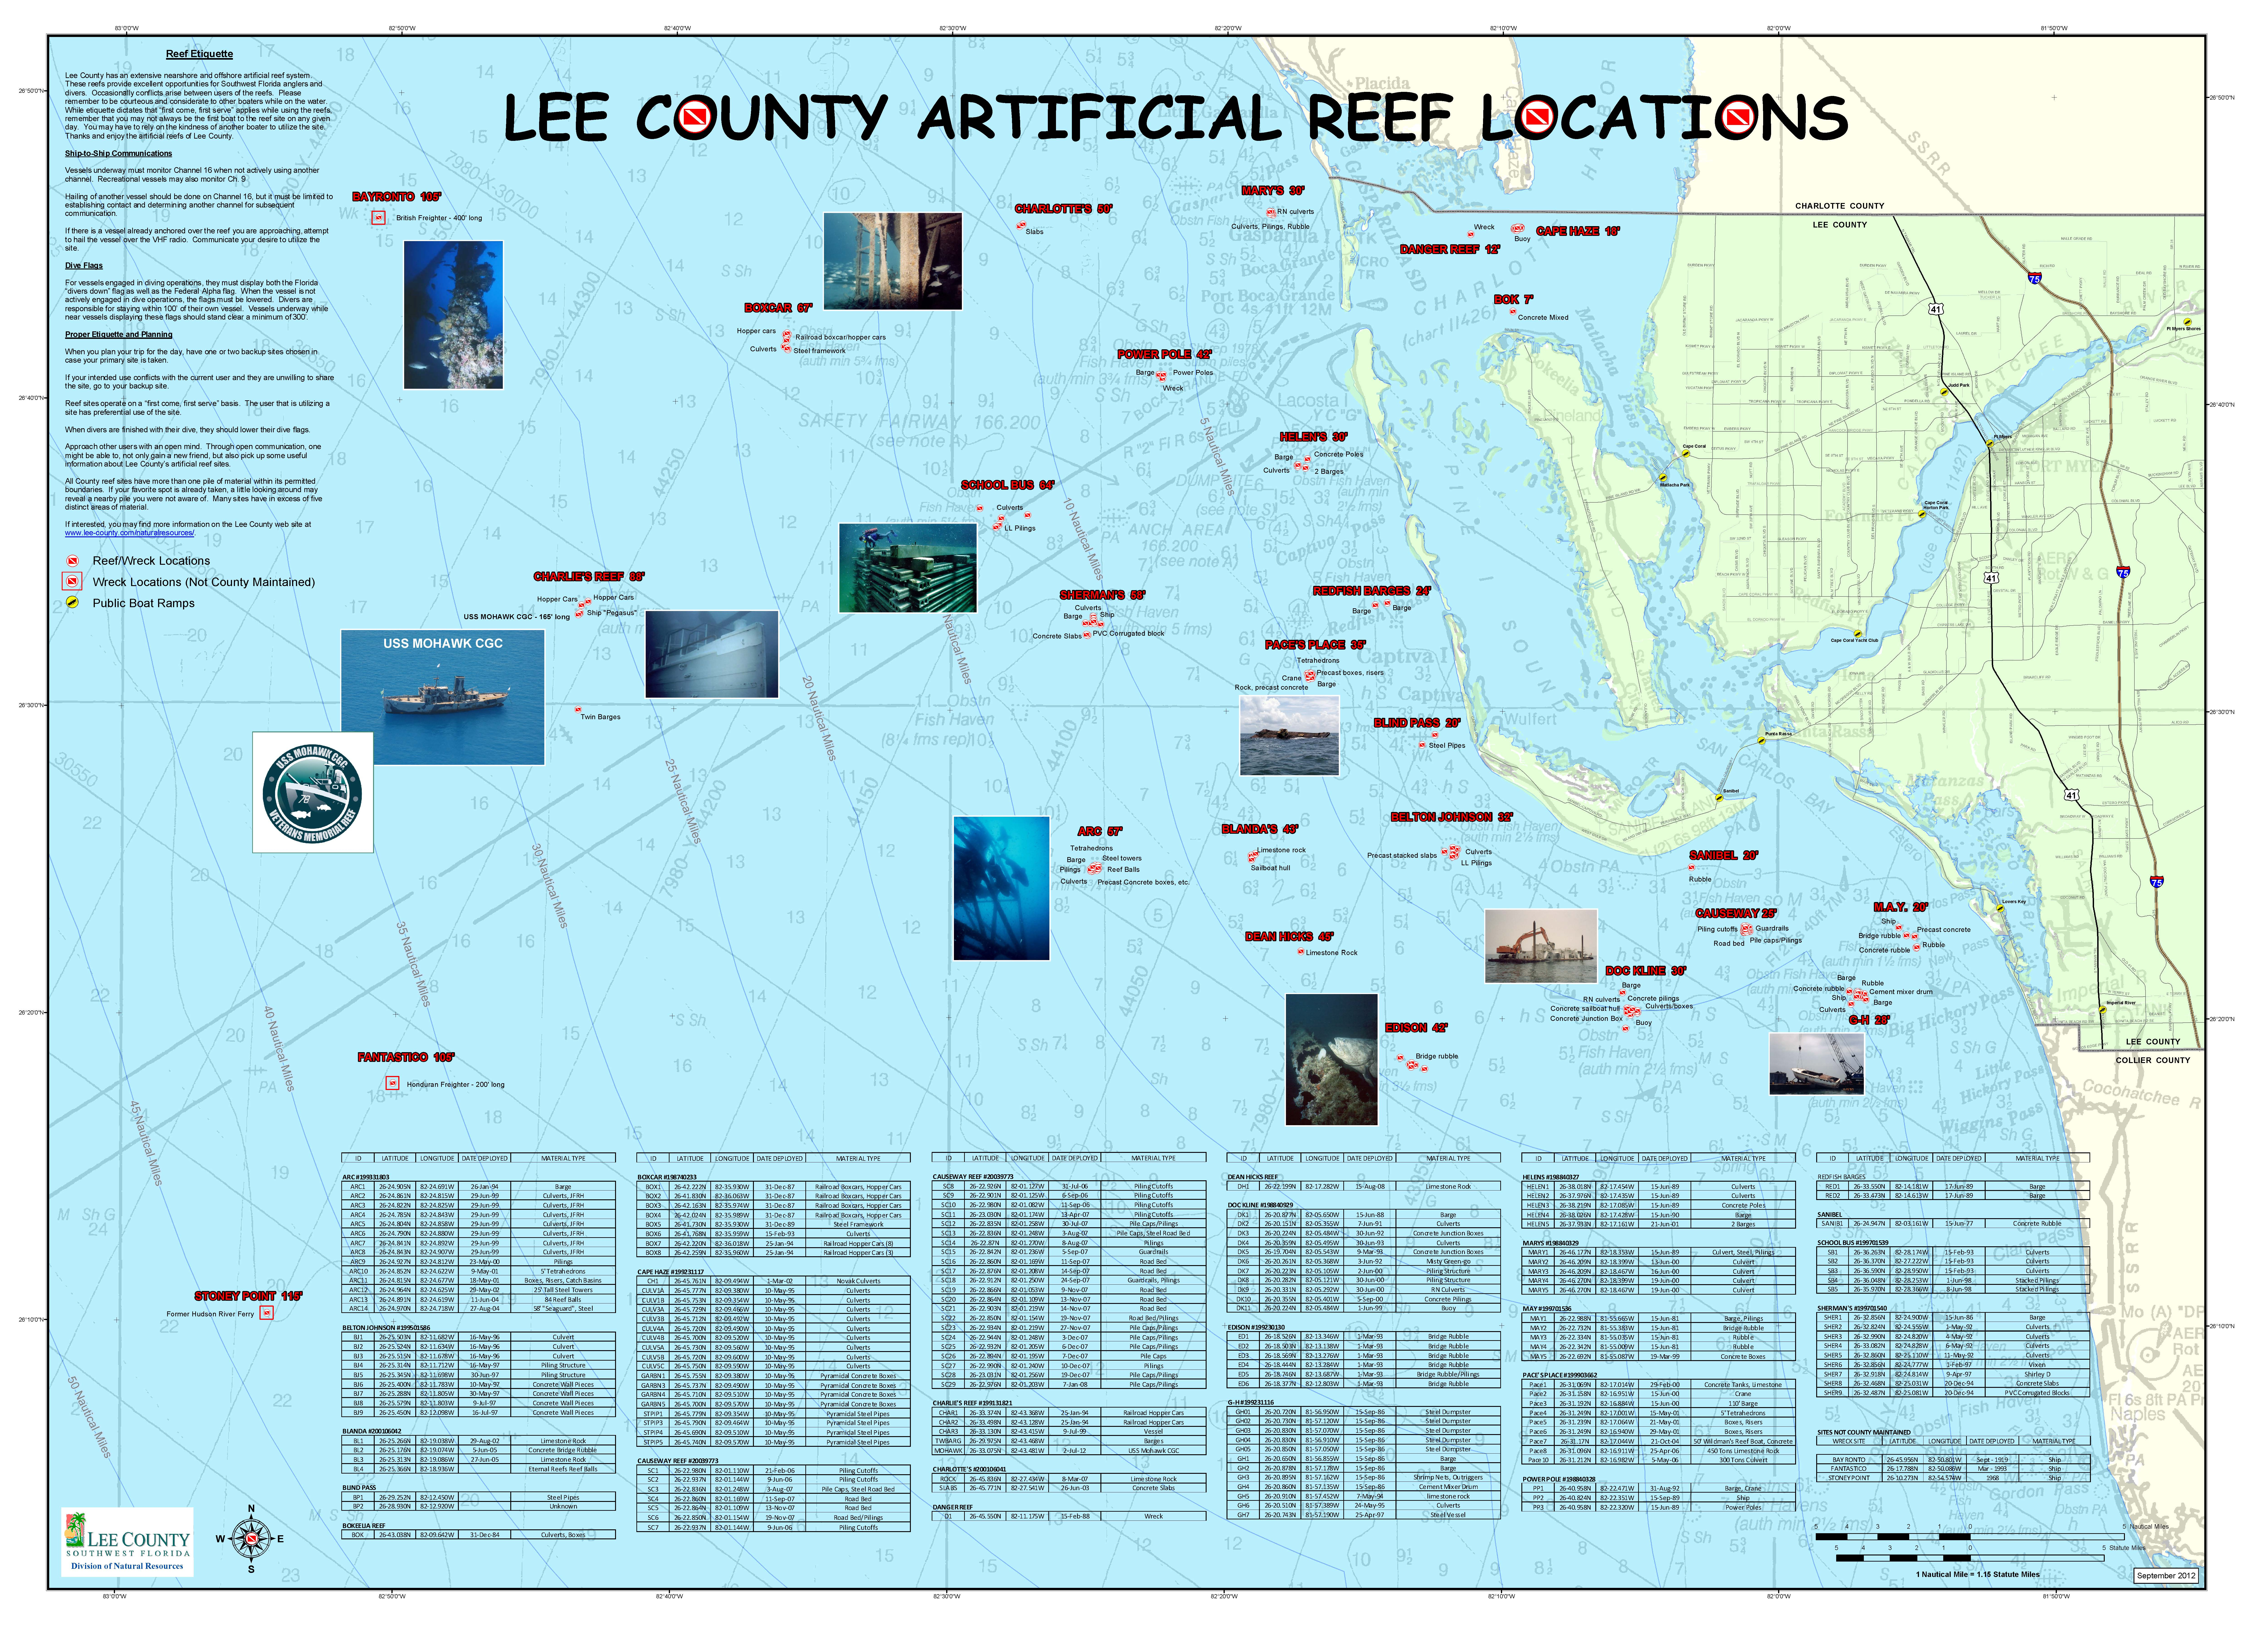 Artificial Reefs - Florida Reef Maps App